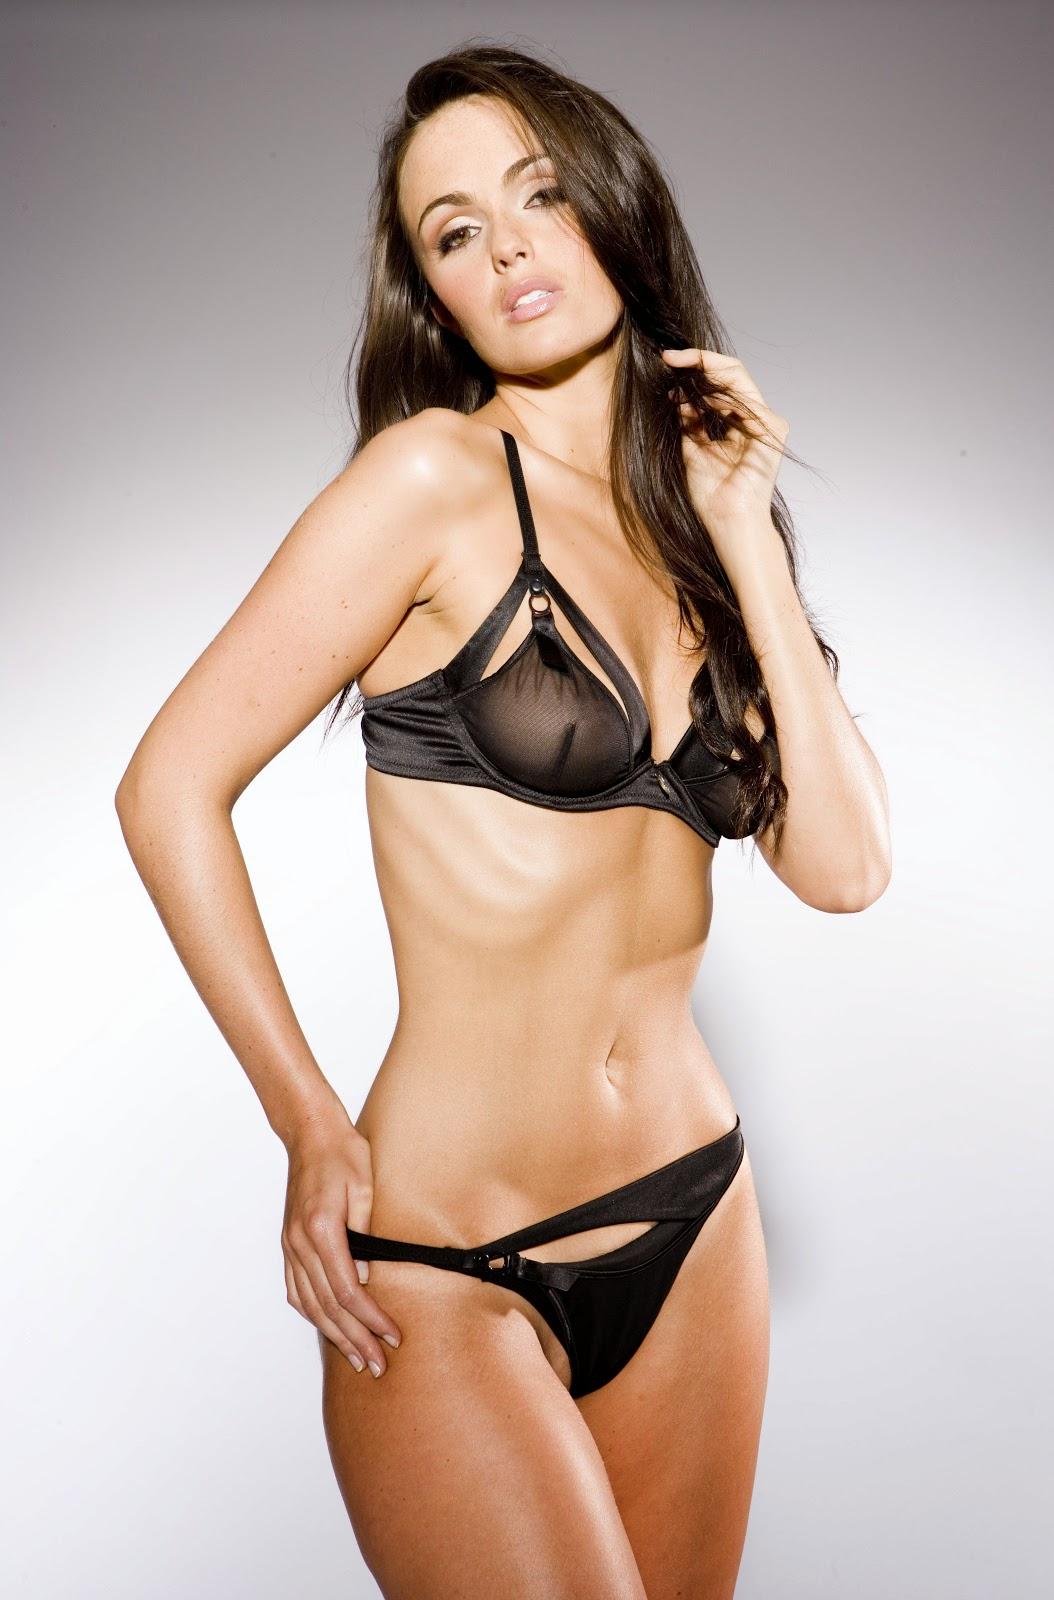 Jennifer Metcalfe sexy lingerie photos